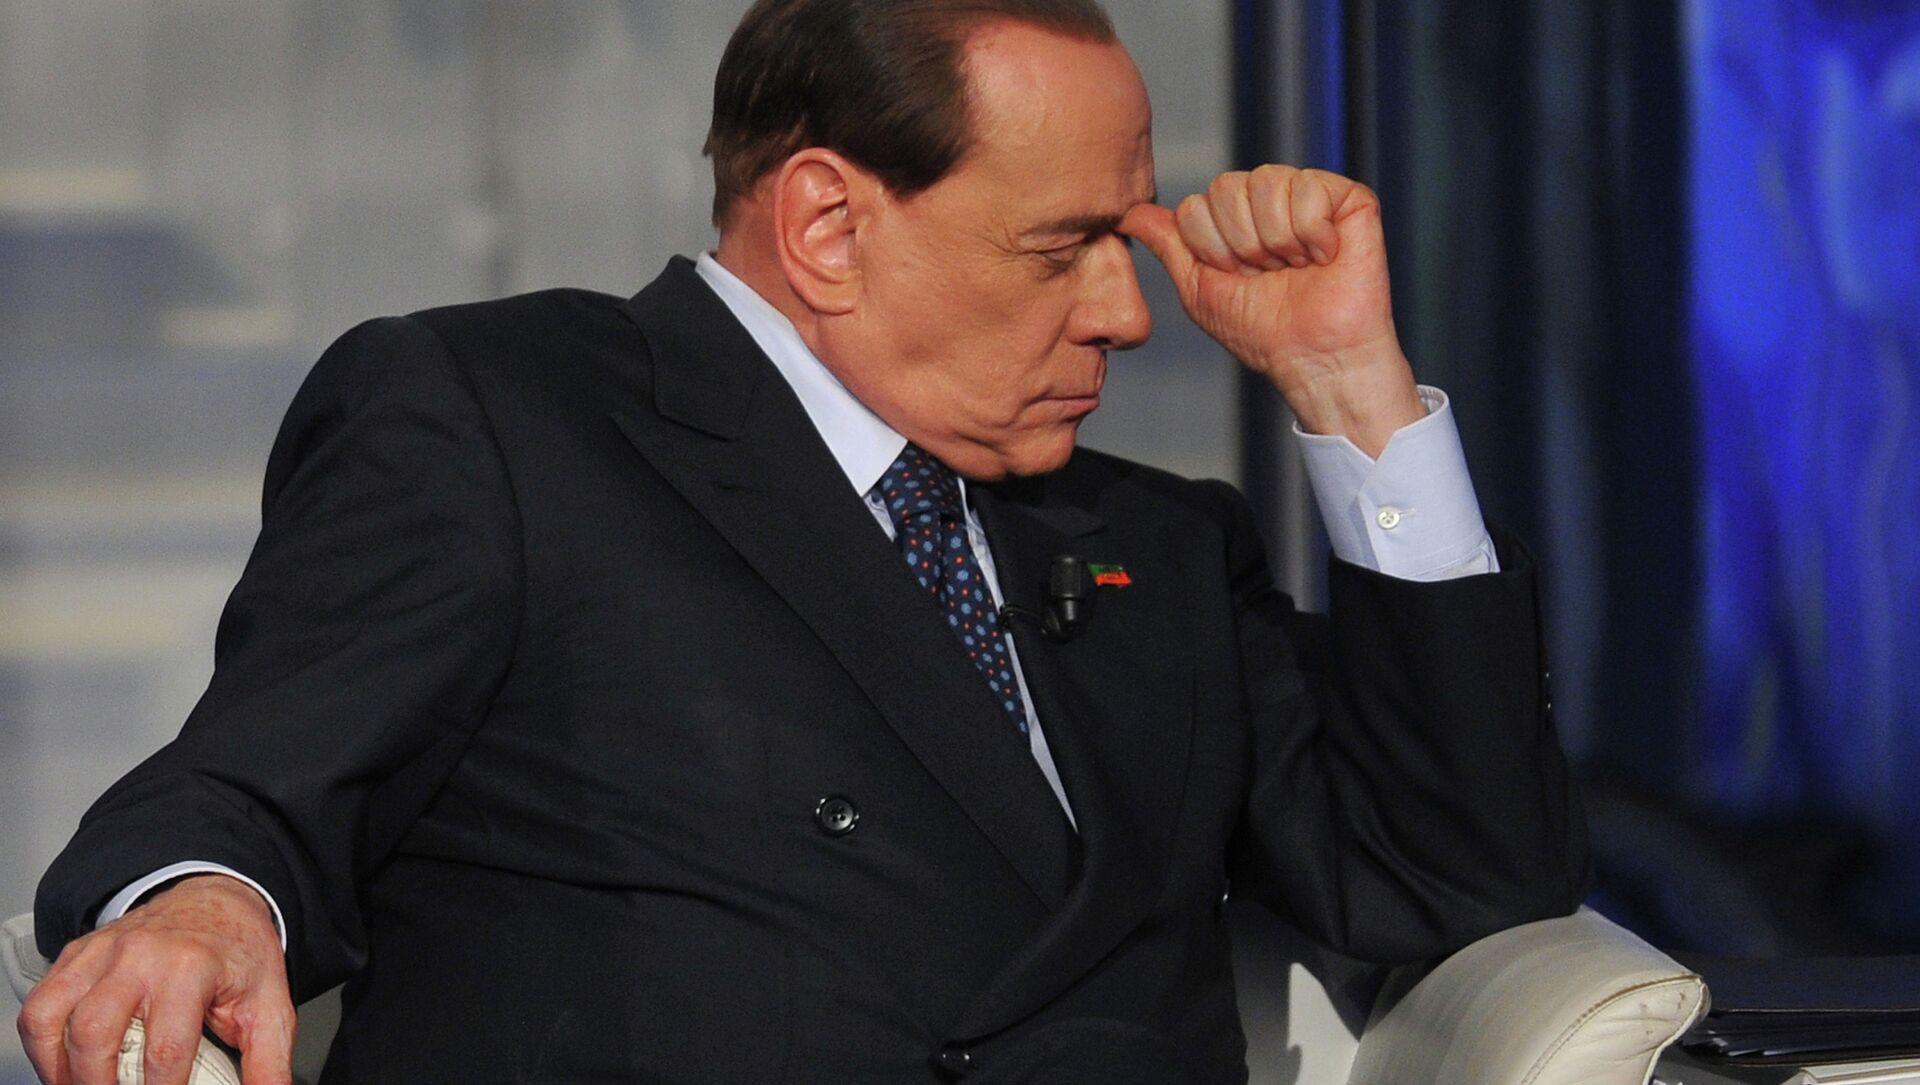 L'ex premier italiano Silvio Berlusconi  - Sputnik Italia, 1920, 21.04.2021